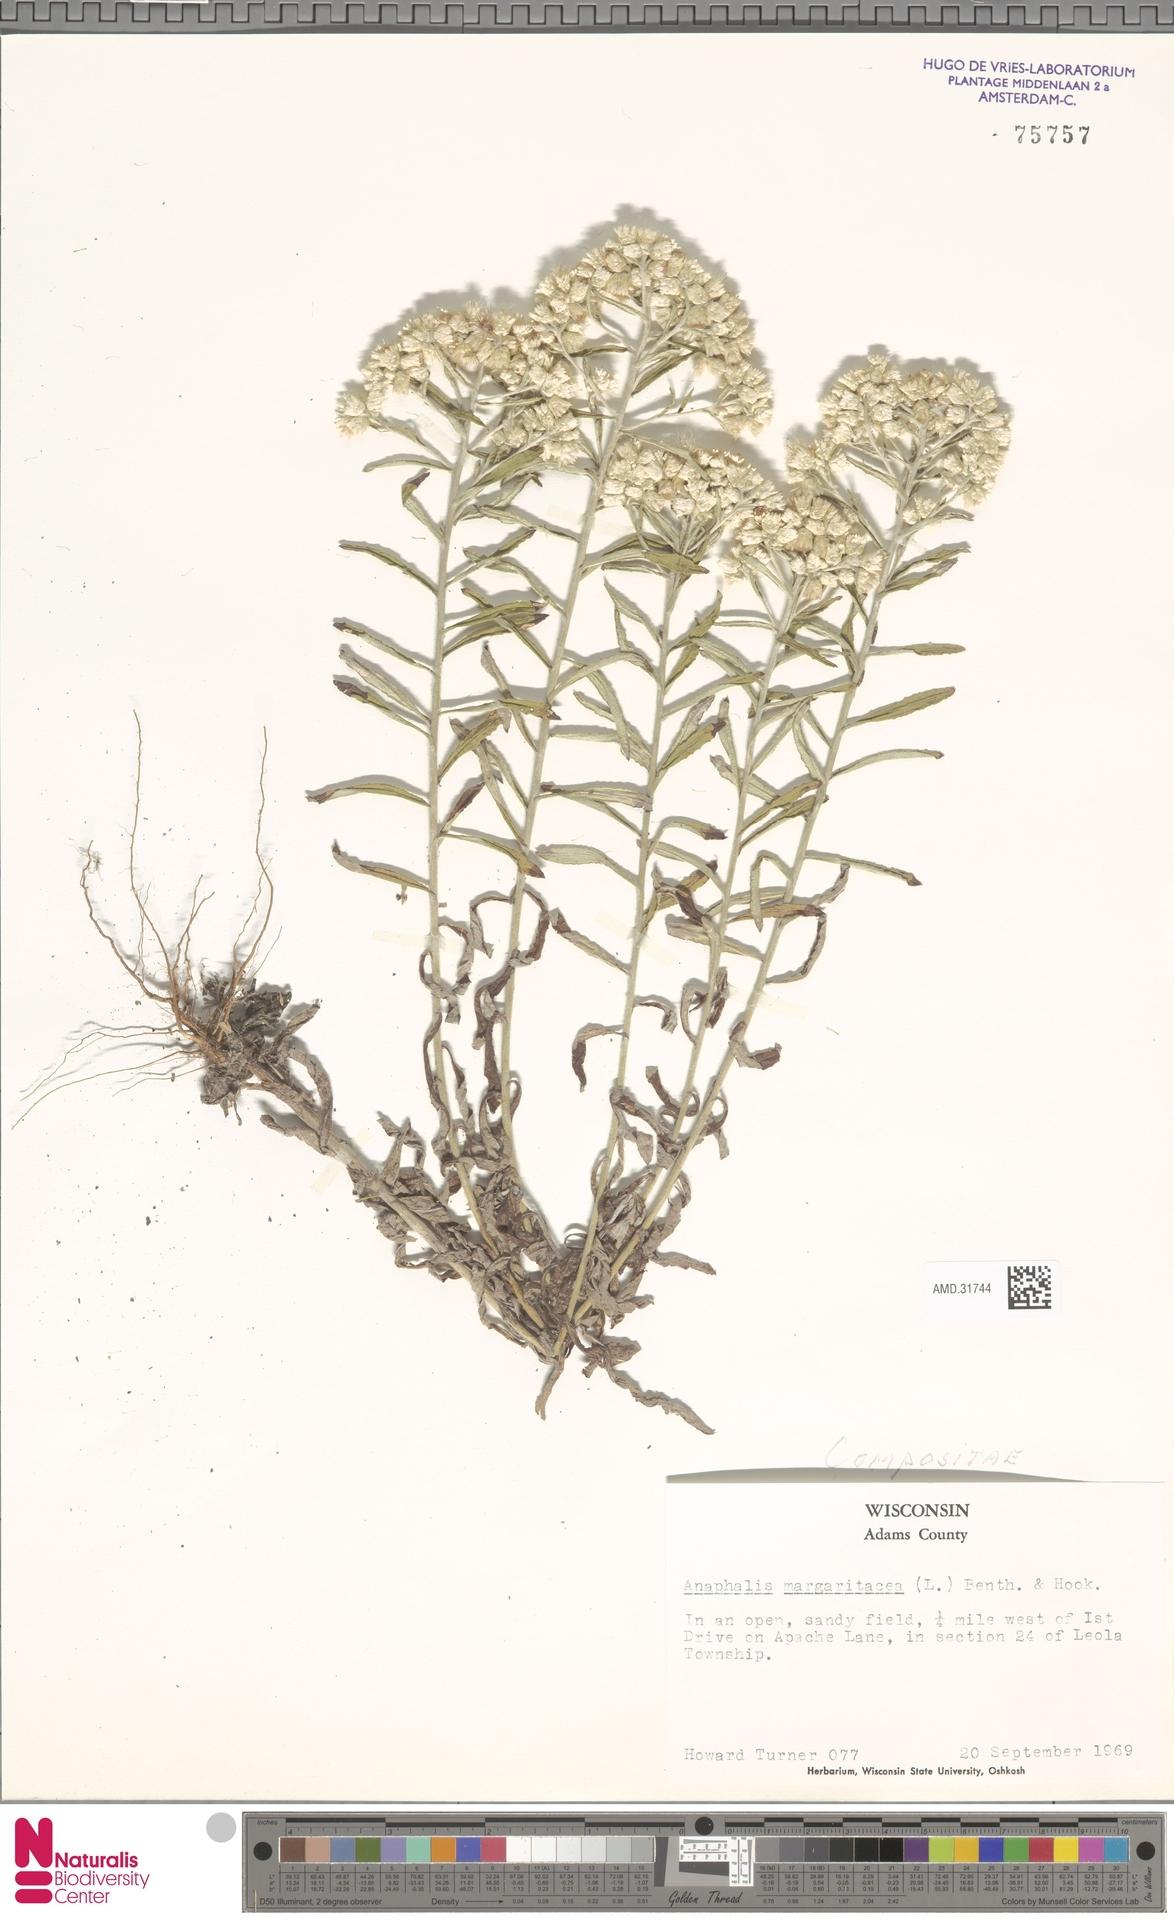 AMD.31744 | Anaphalis margaritacea (L.) Benth. & Hook.f.